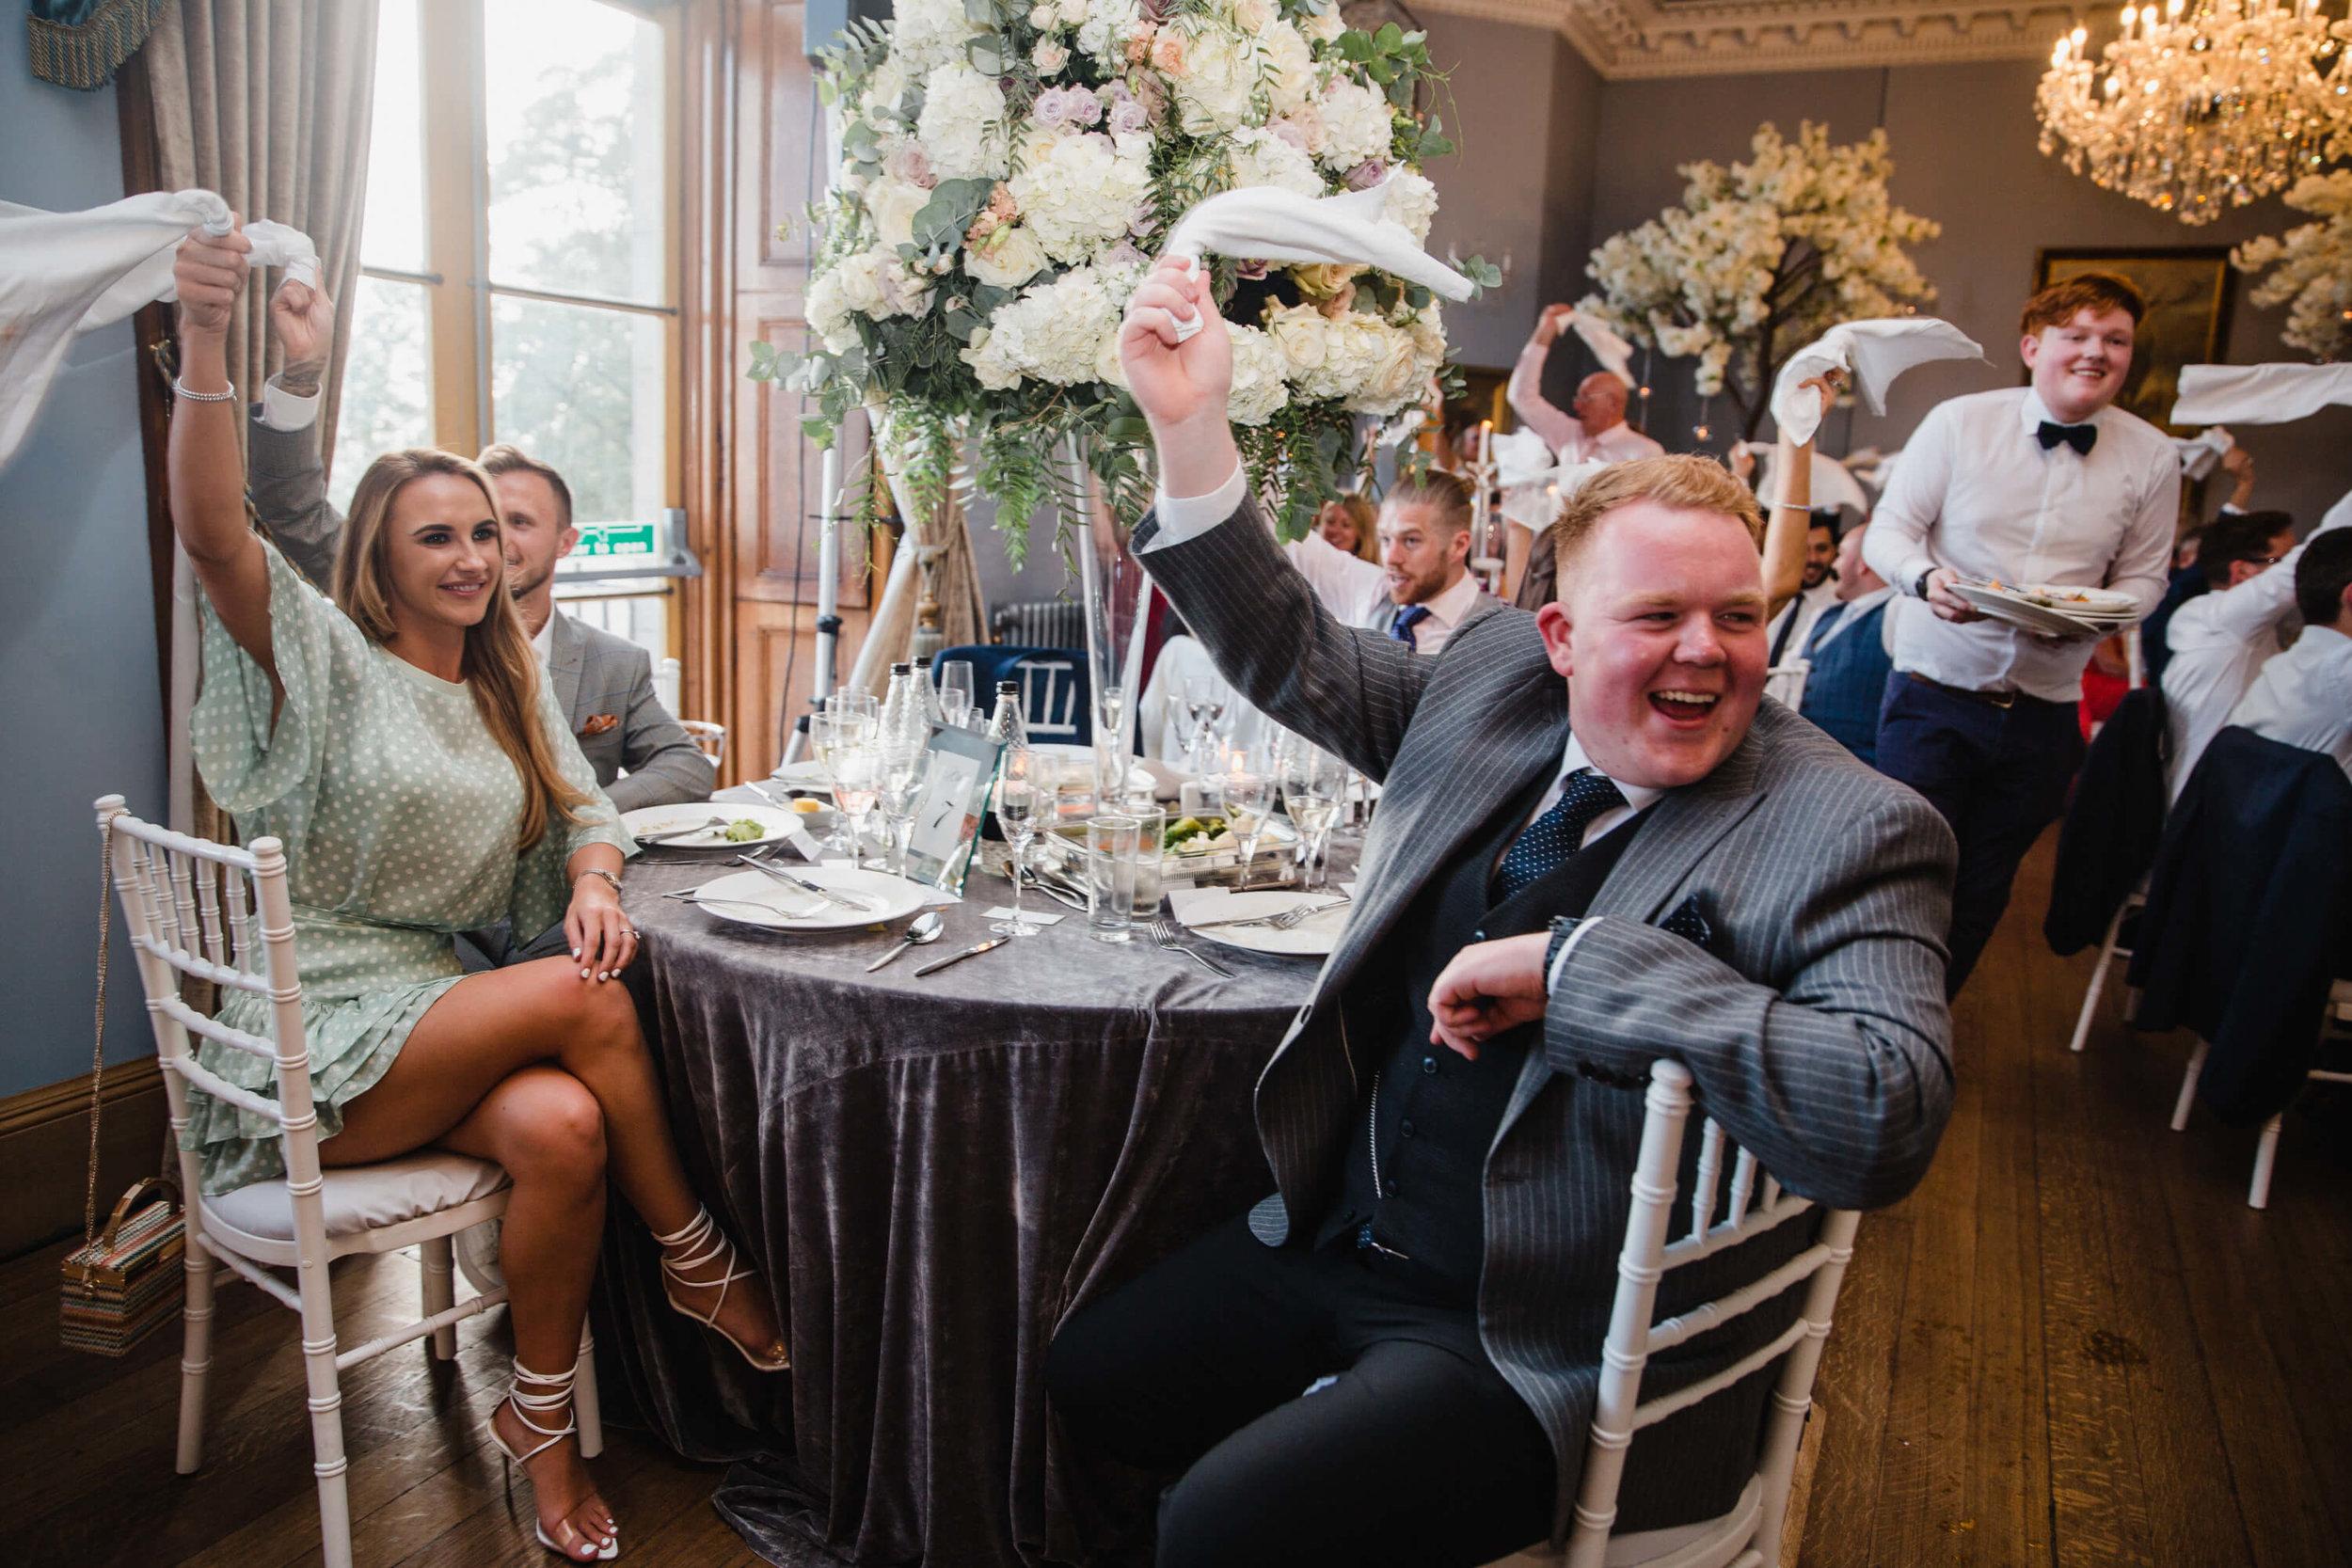 wedding guests waving handkerchiefs while singing